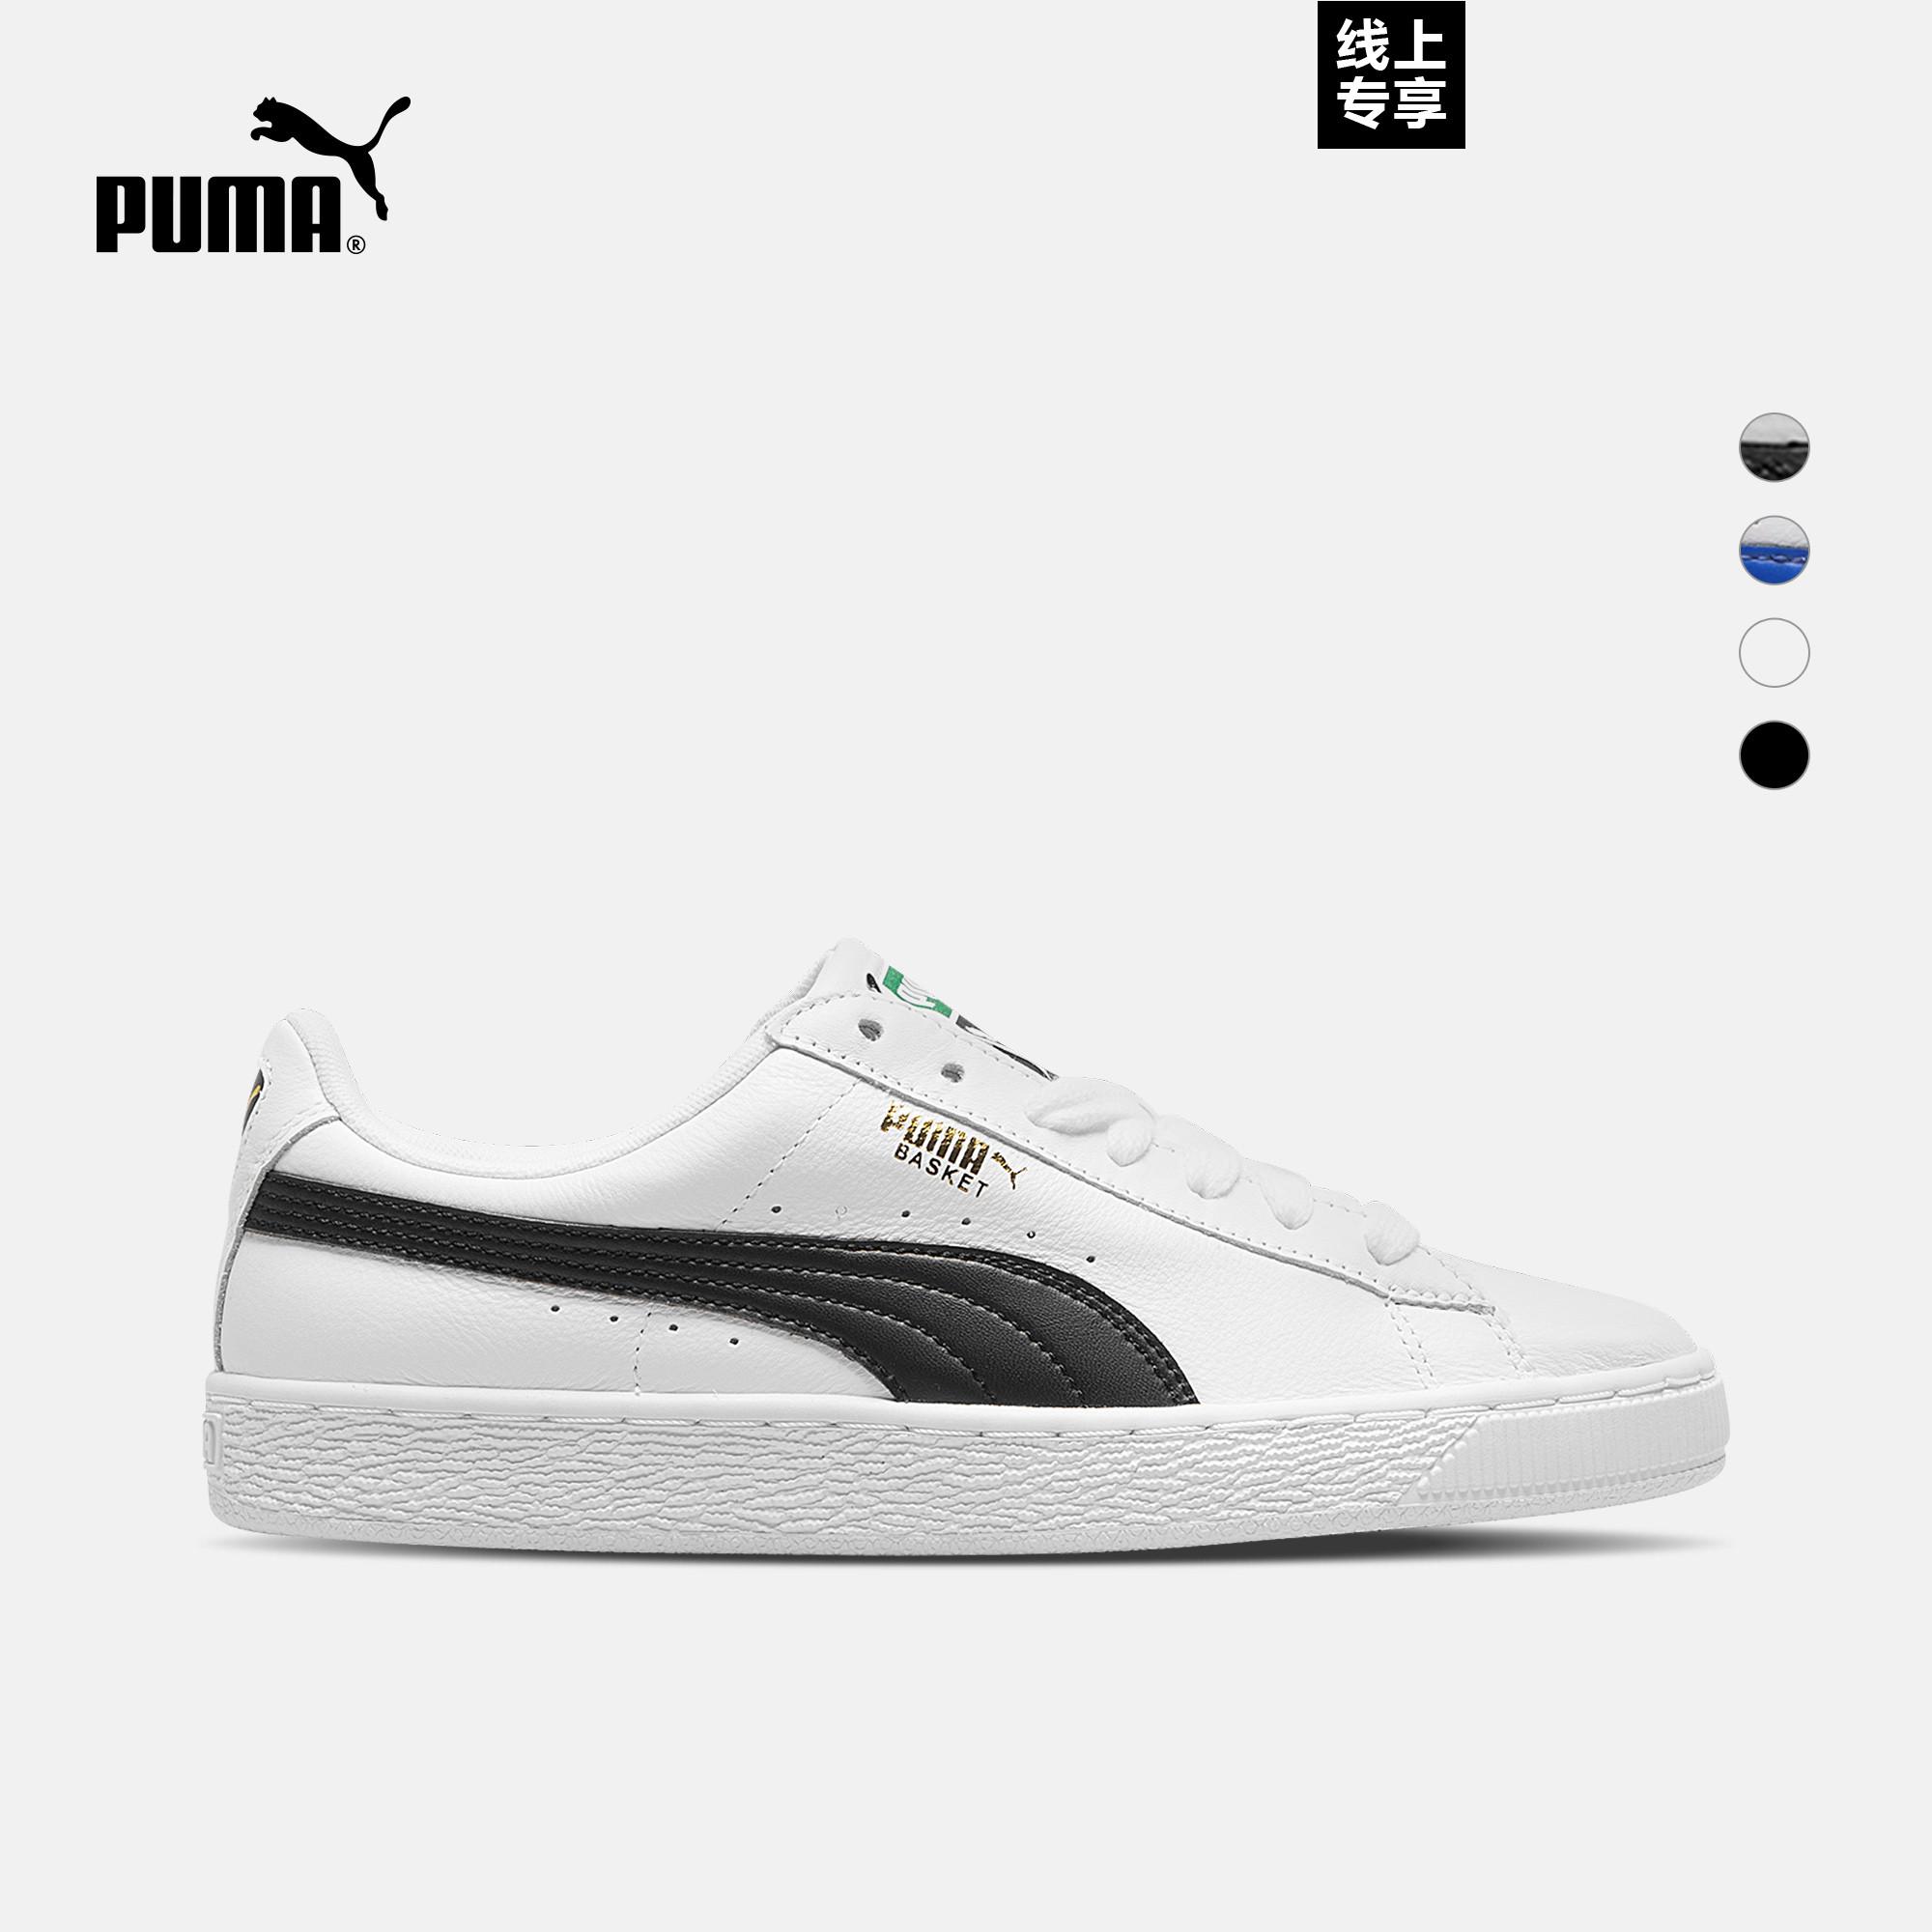 PUMA彪马官方 男女同款休闲鞋 Basket Classic LFS 354367